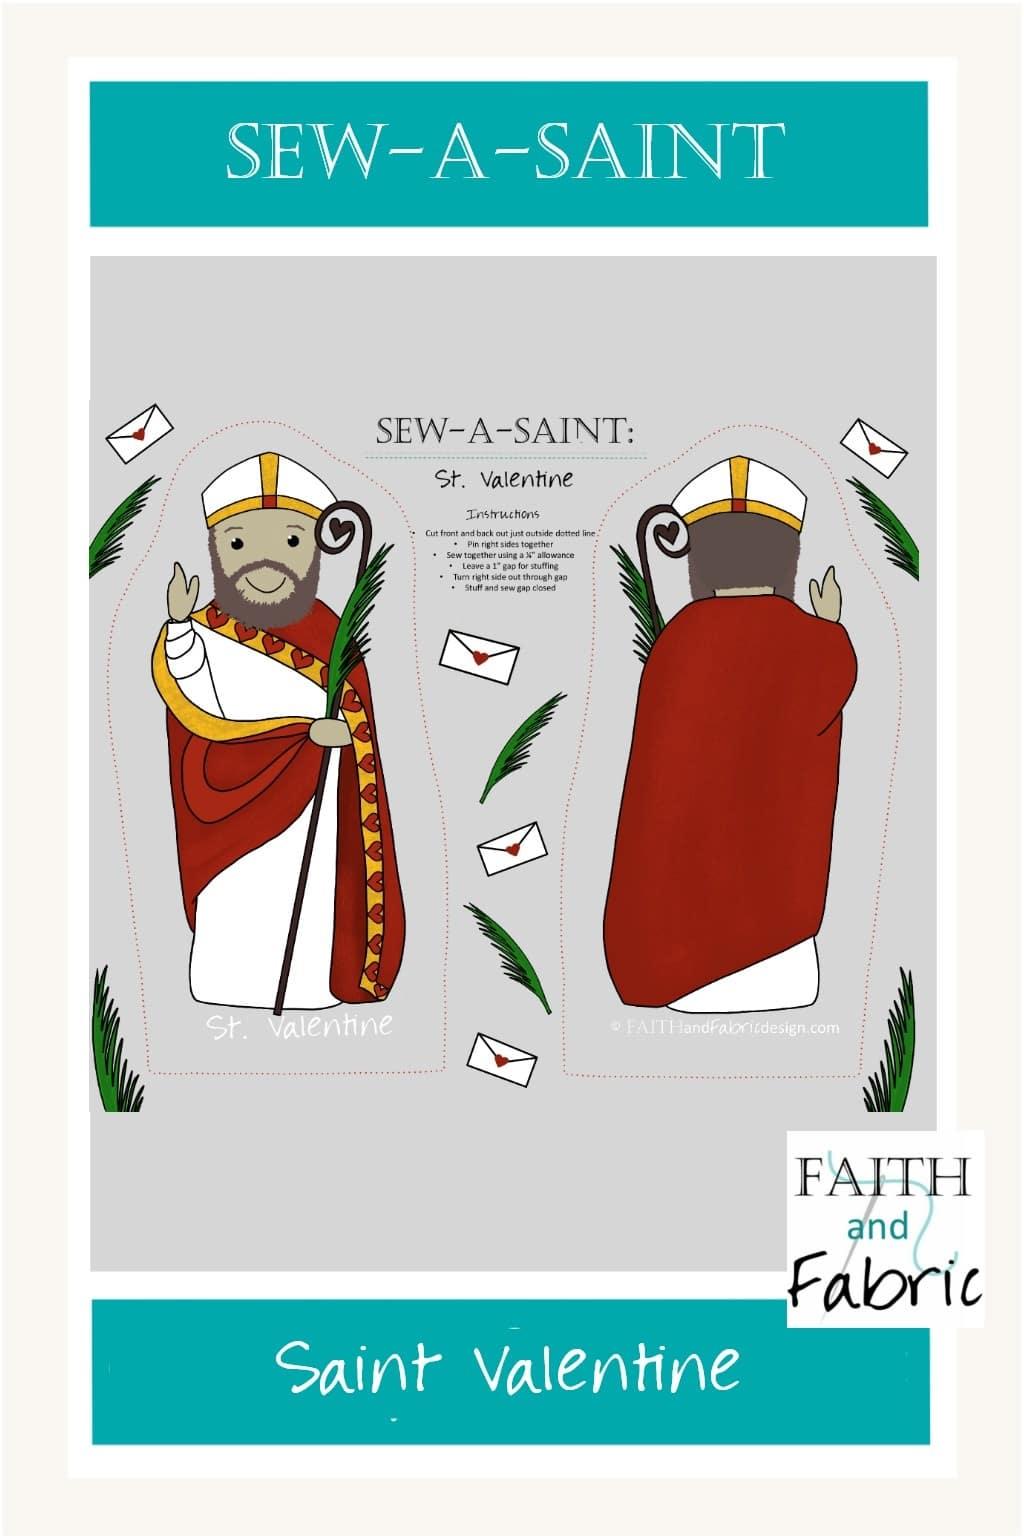 Sew What St Paul : Sew-a-Saint, Saint, Valentine, Faith, Fabric